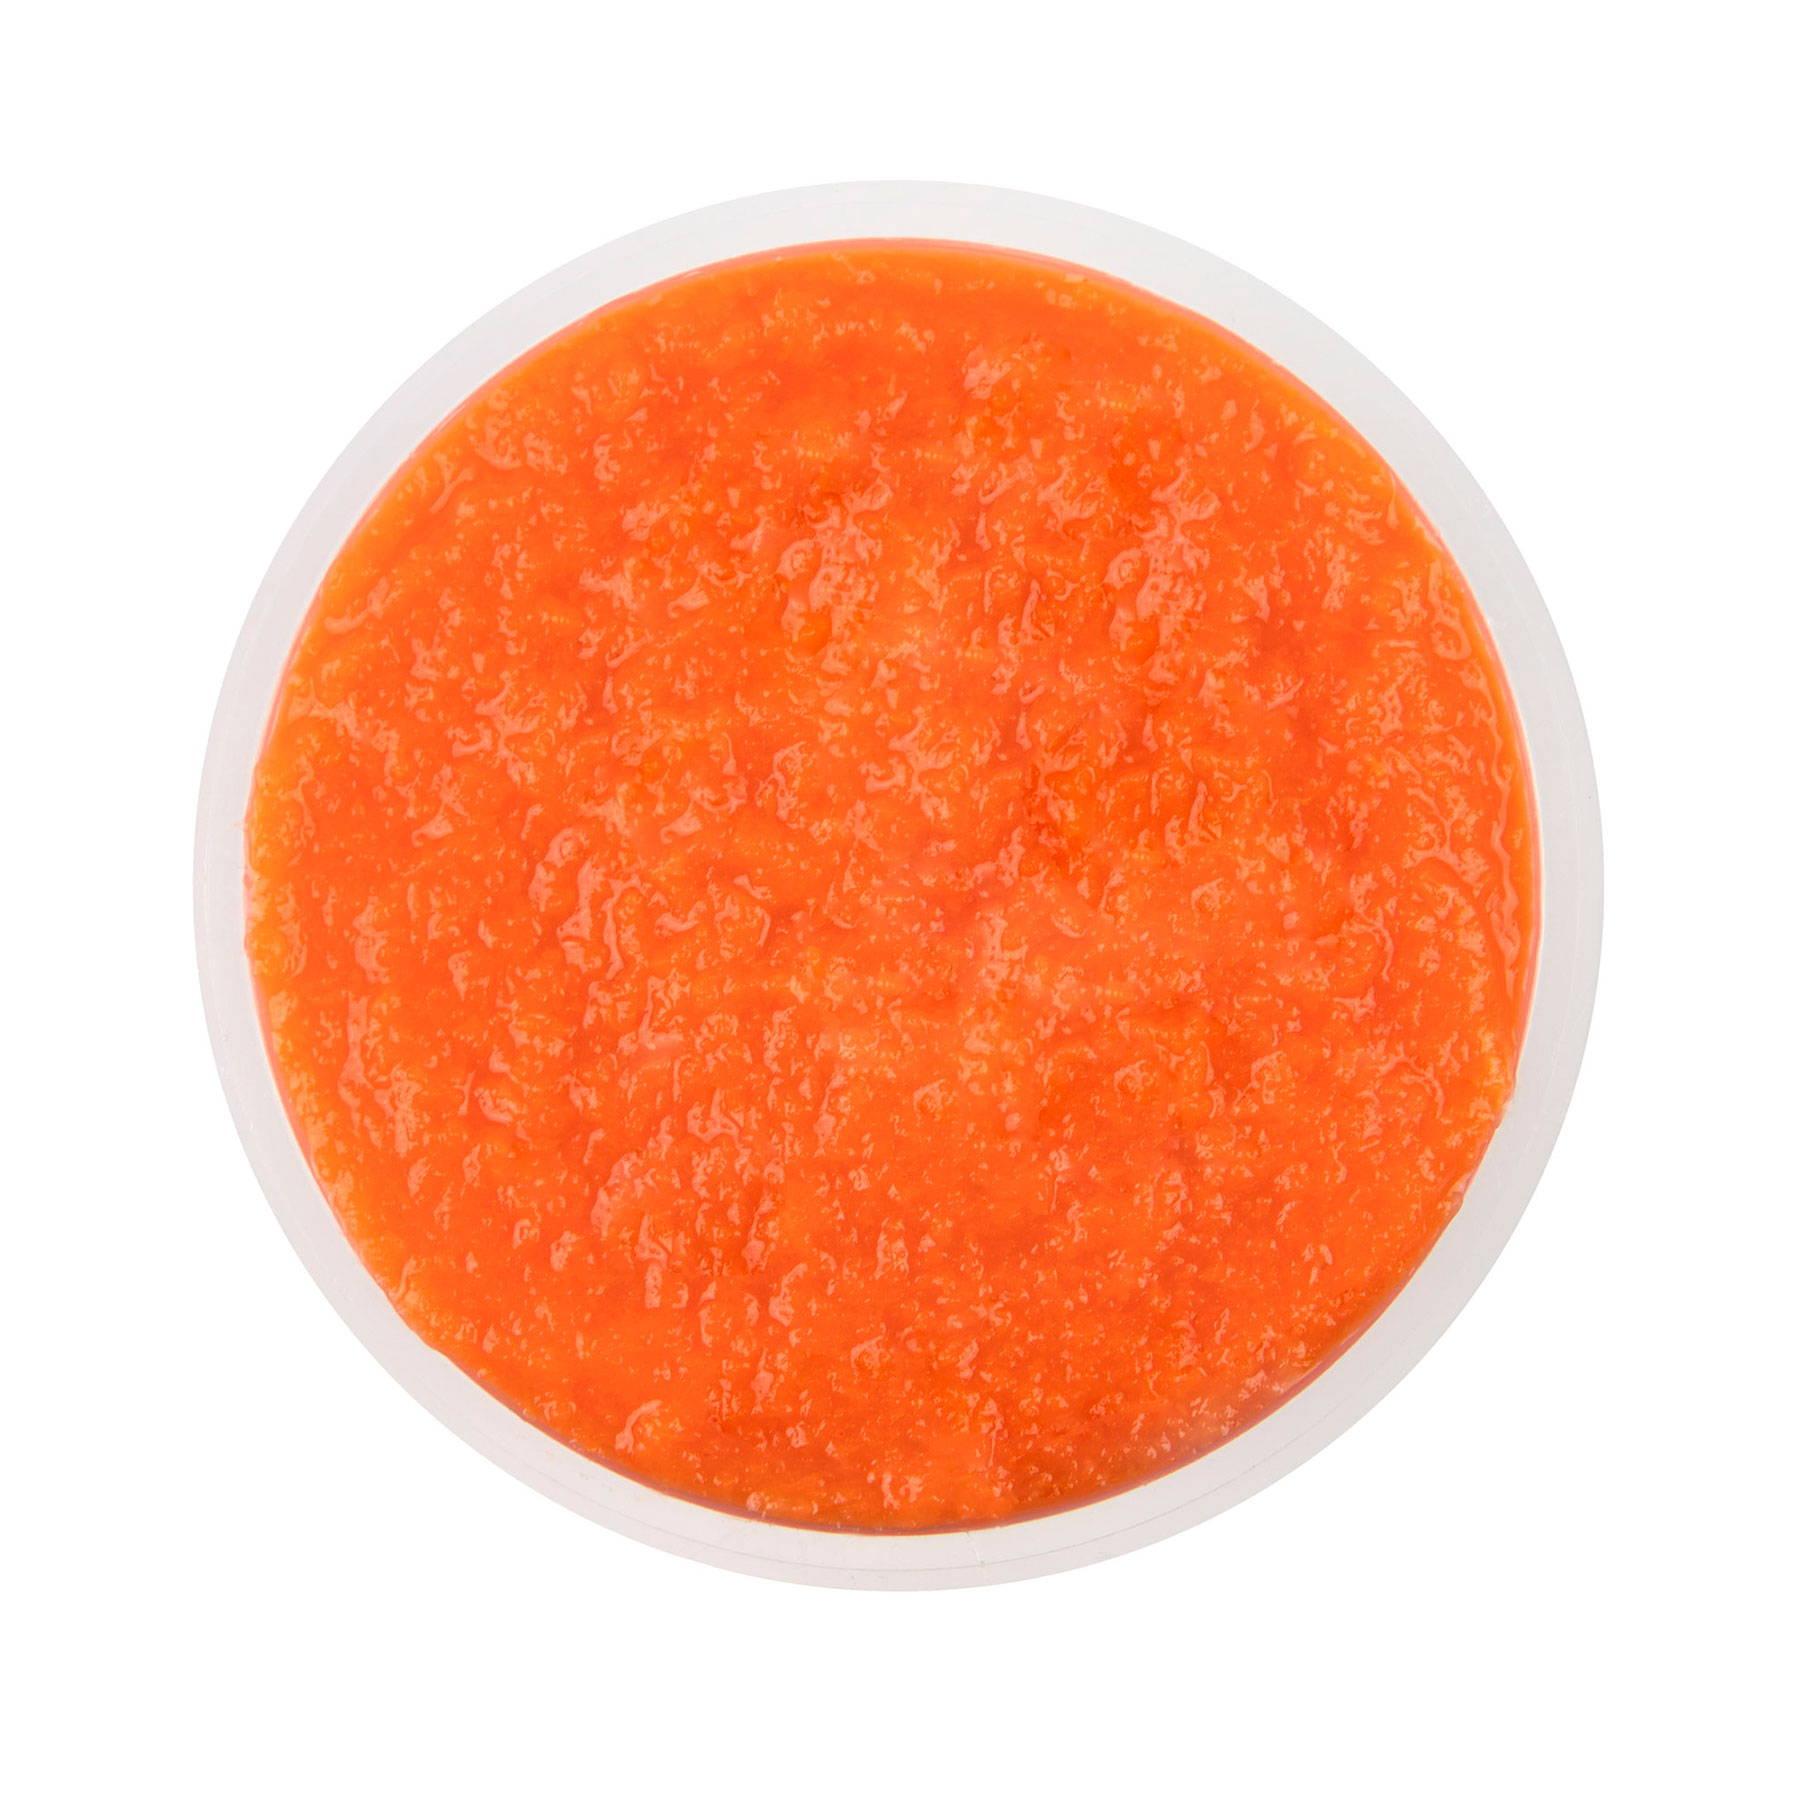 Karotte & Süßkartoffel